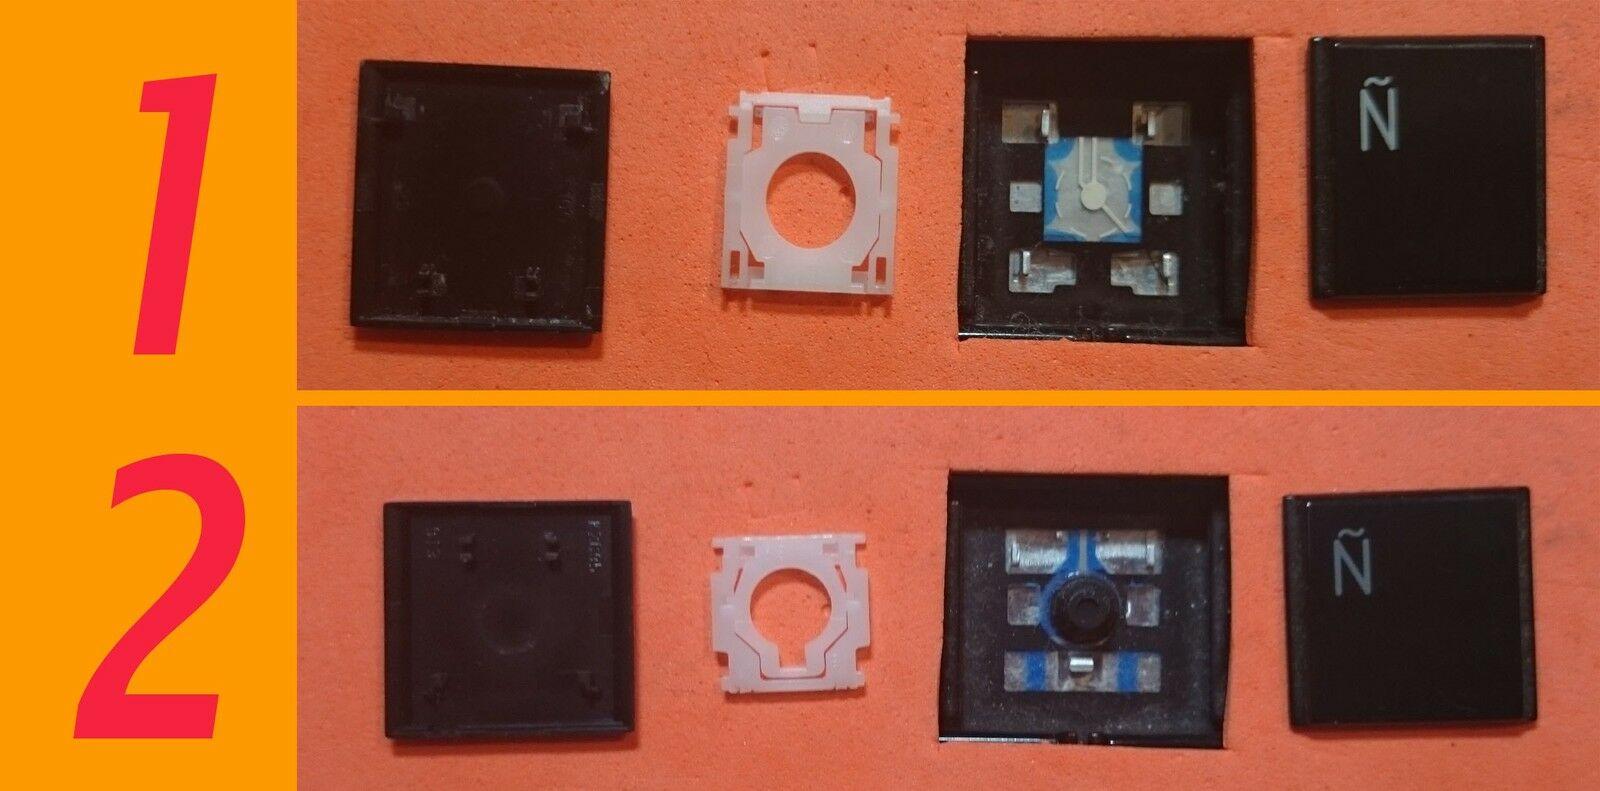 TECLA TECLAS DE TECLADO TOSHIBA SATELLITE L500 L500D L505 A500 A500D